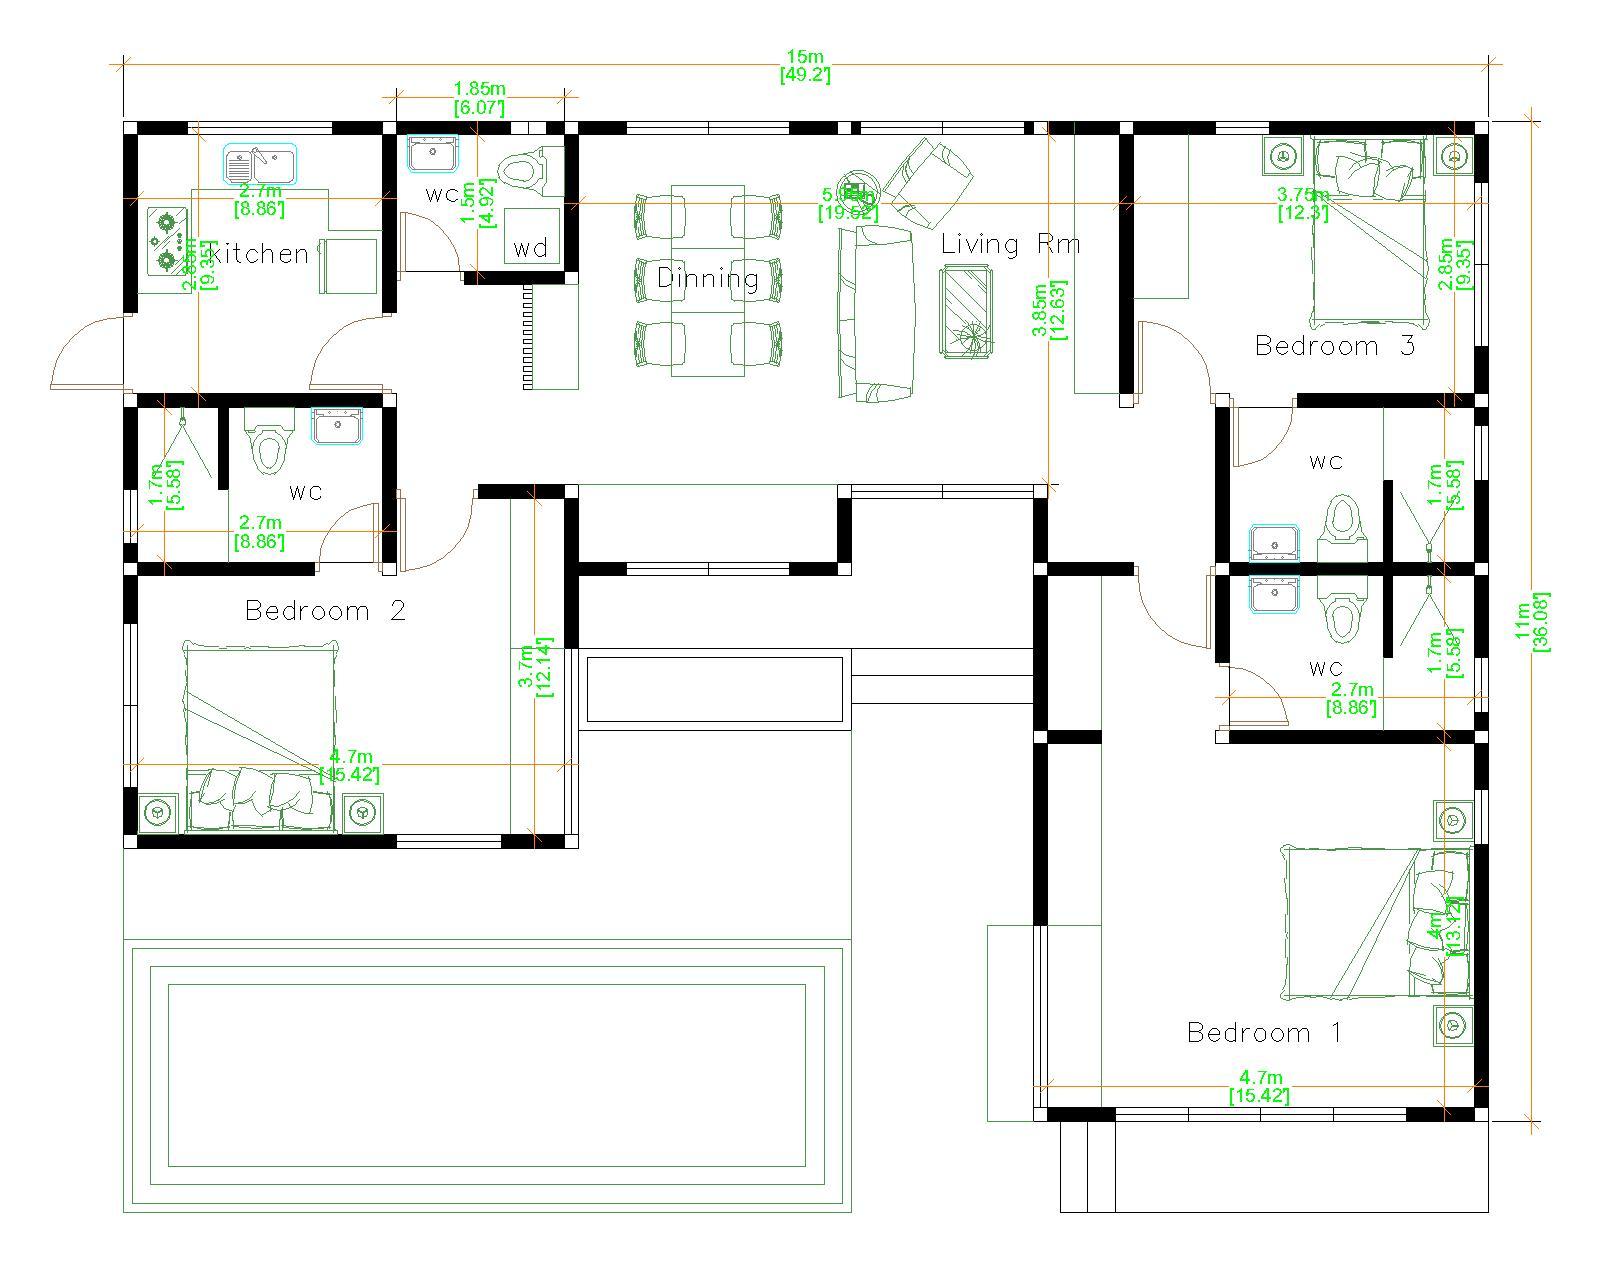 Cool House Plans 15x11 Meter 49x36 Feet 3 Beds floor plan